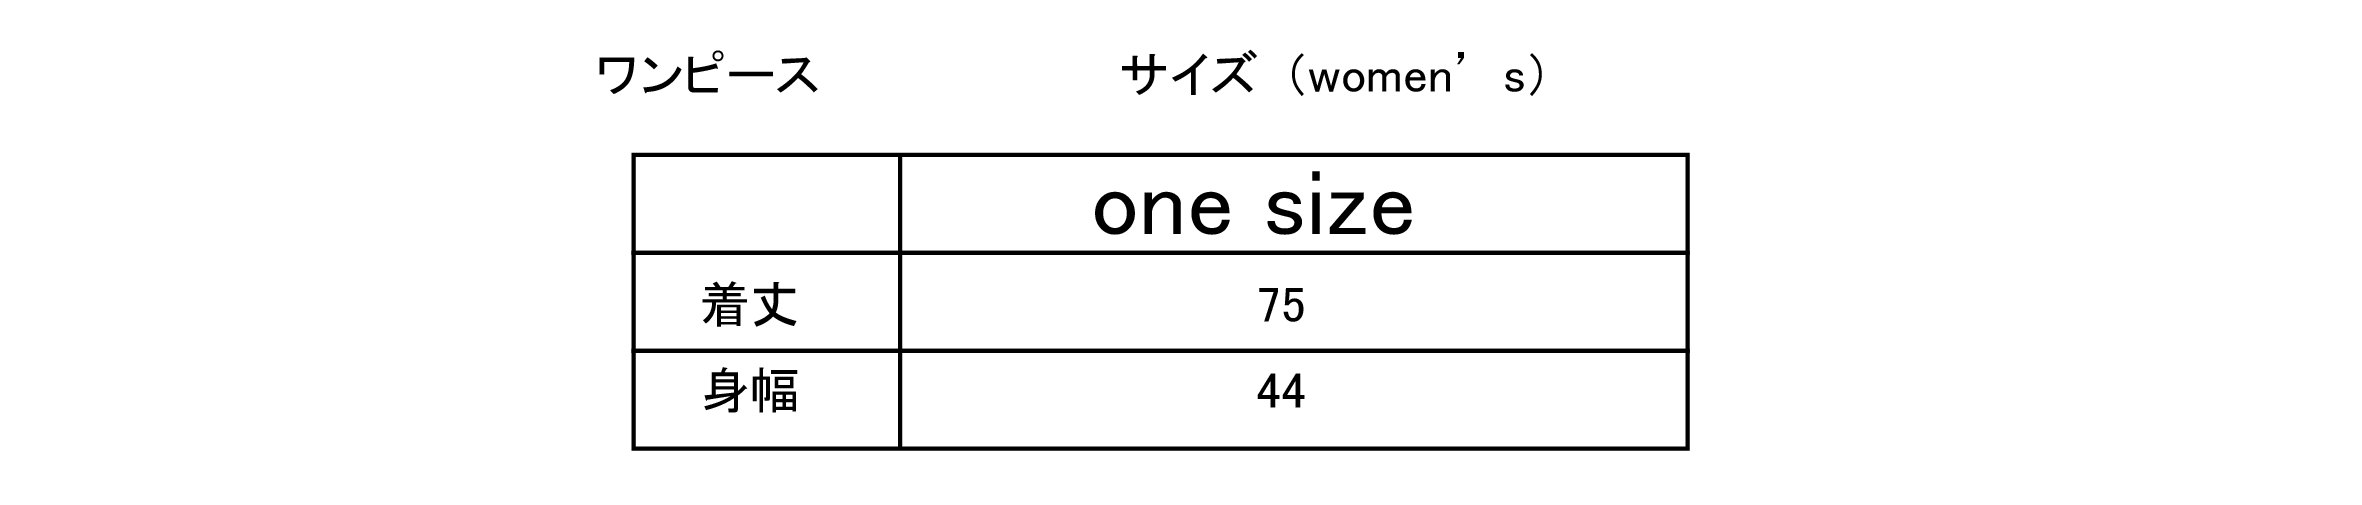 /data/project/134/繝ッ繝ウ繝偵z繧オ繧、繧ケ繧.jpg?1476695563